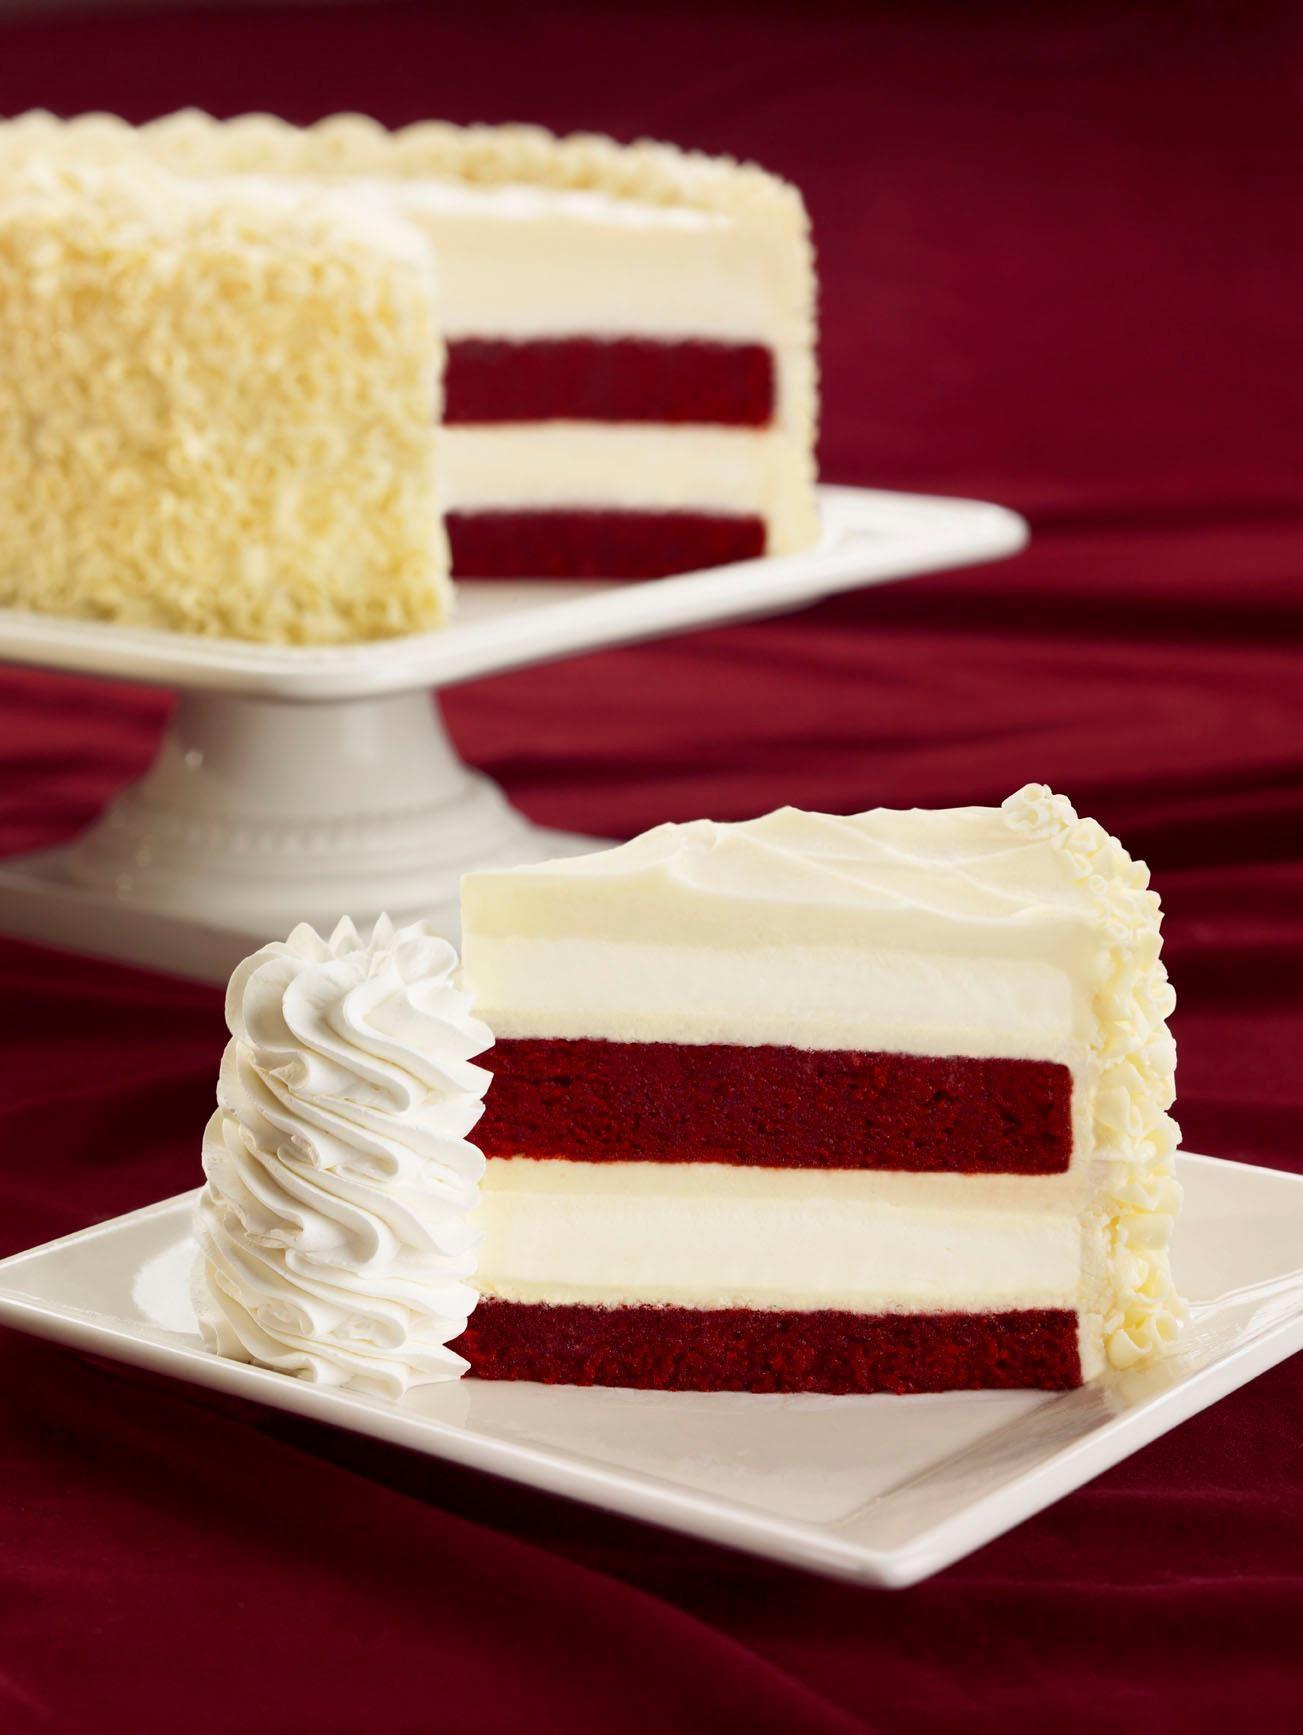 Red Velvet Cheesecake : Red Velvet Cheesecake Recipe   Dishmaps